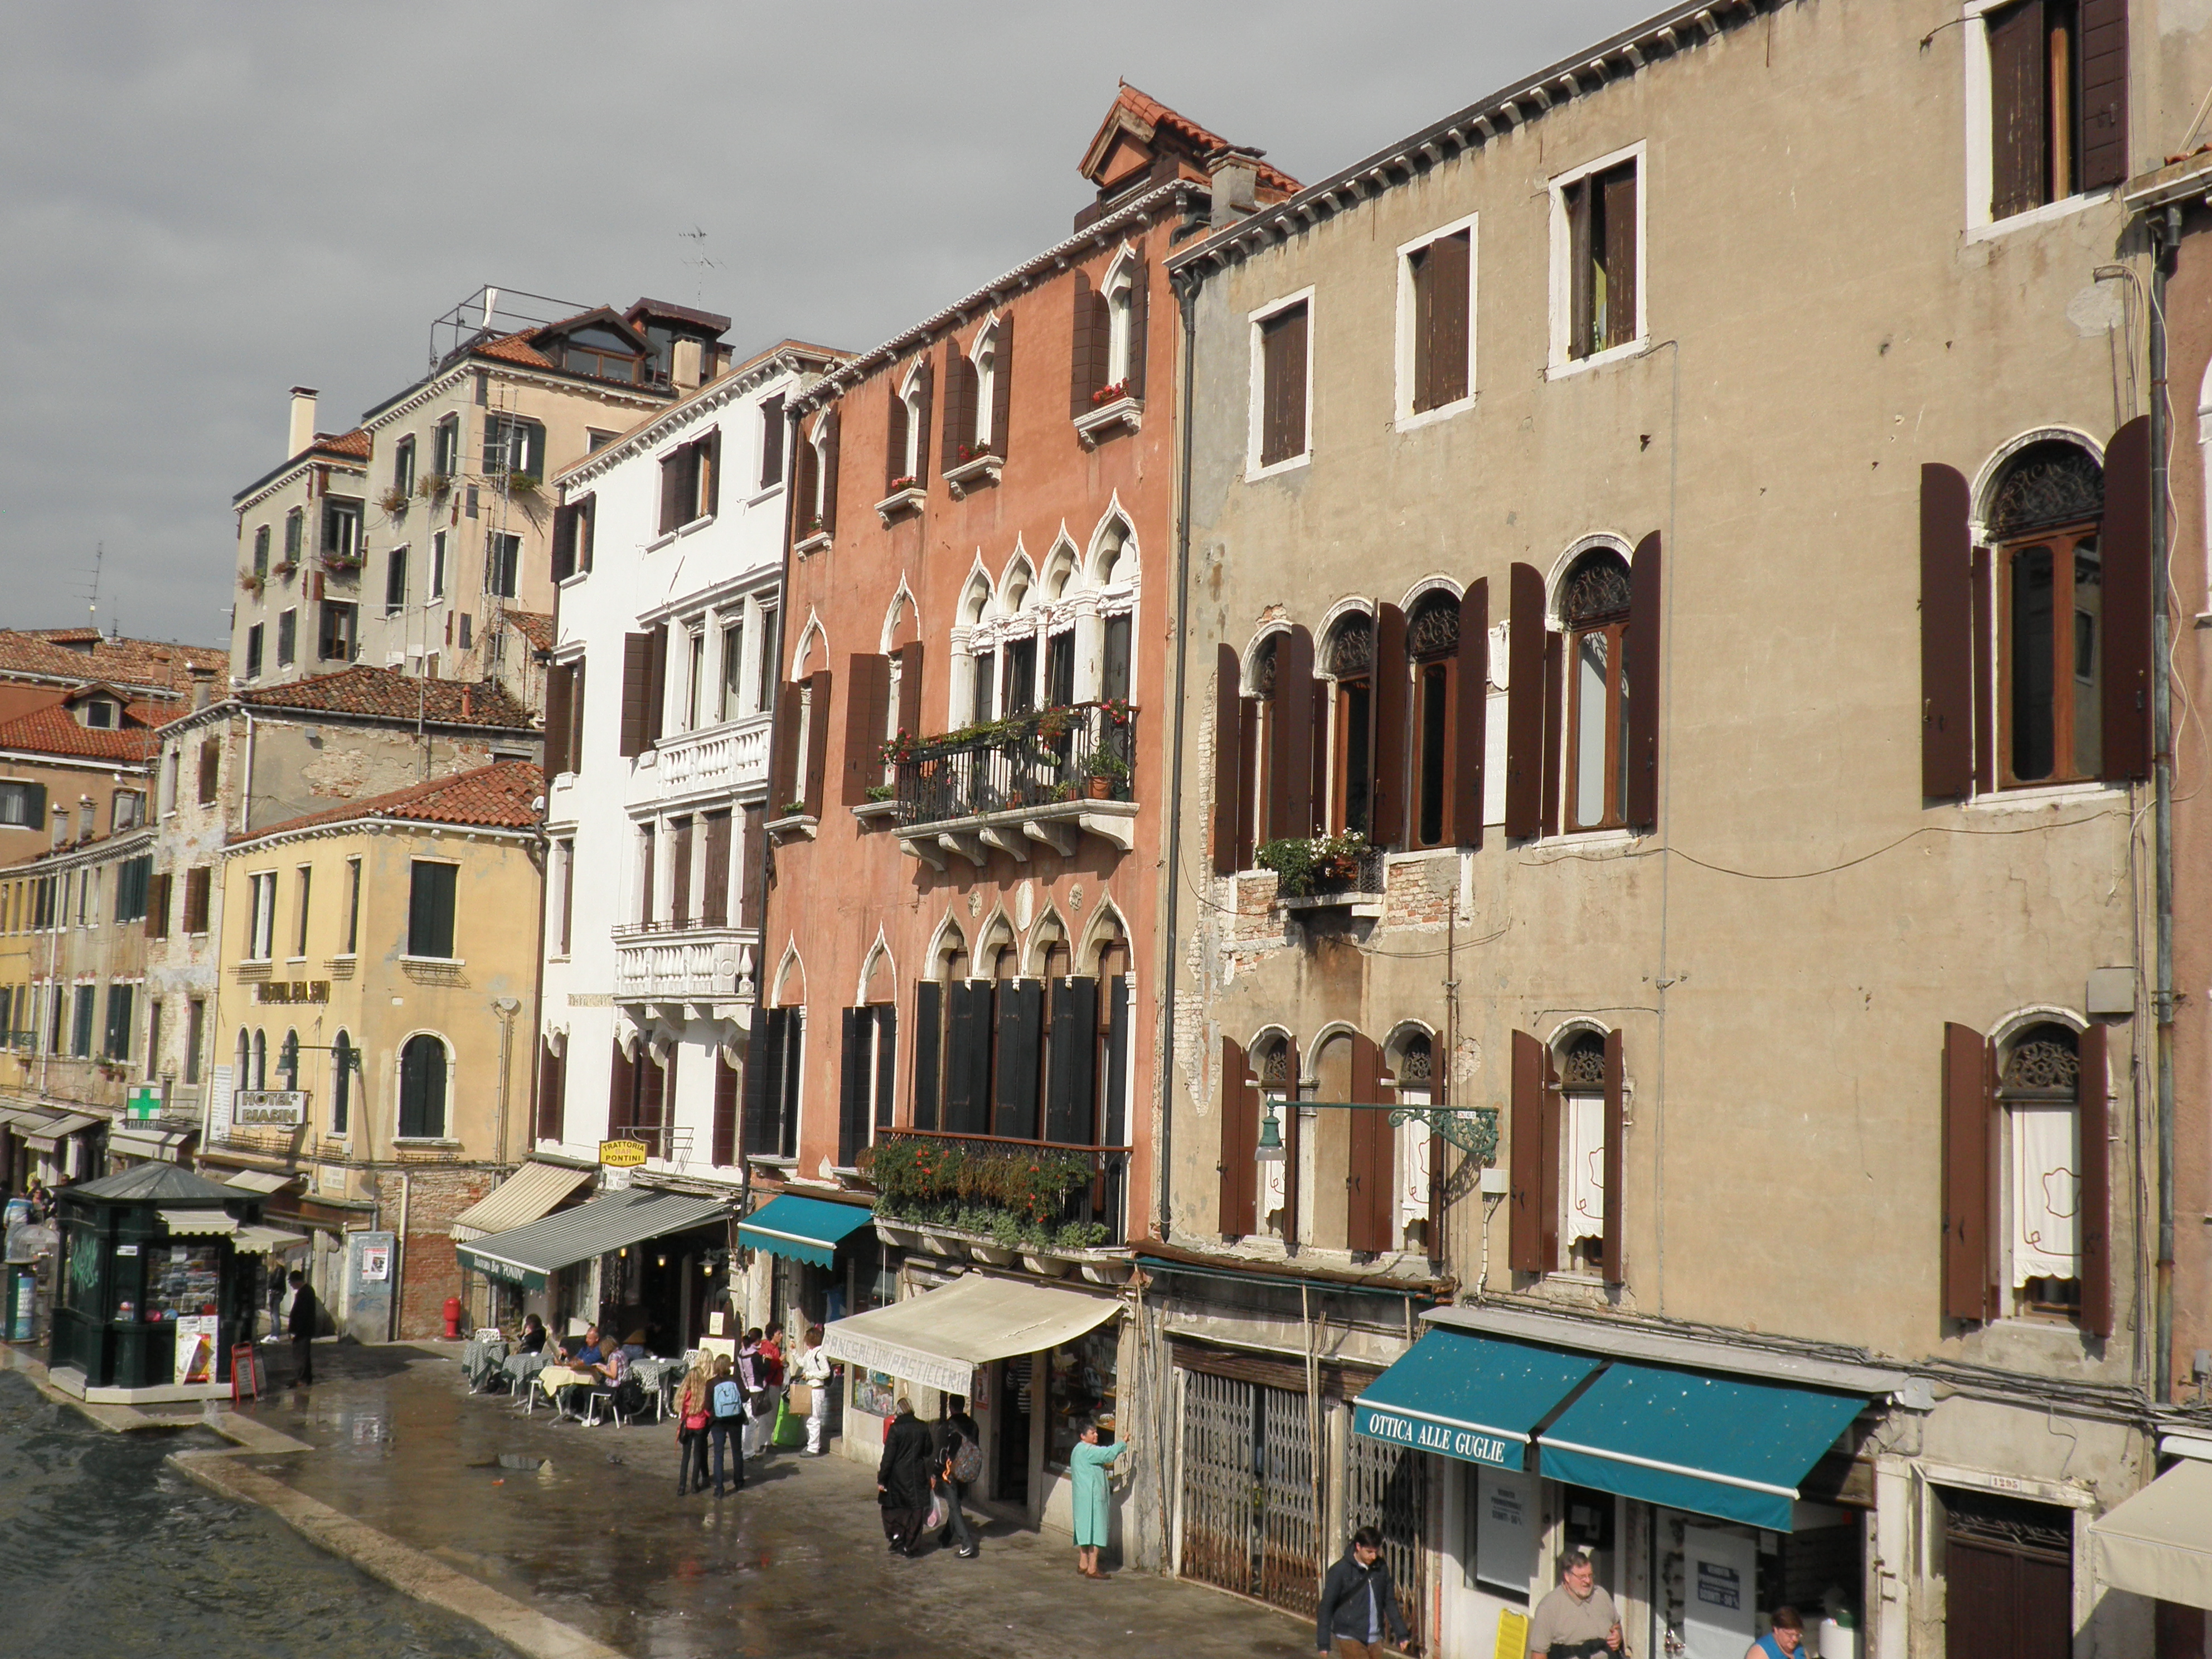 Venice buildings, Architecture, Beautiful, Buildings, Europe, HQ Photo